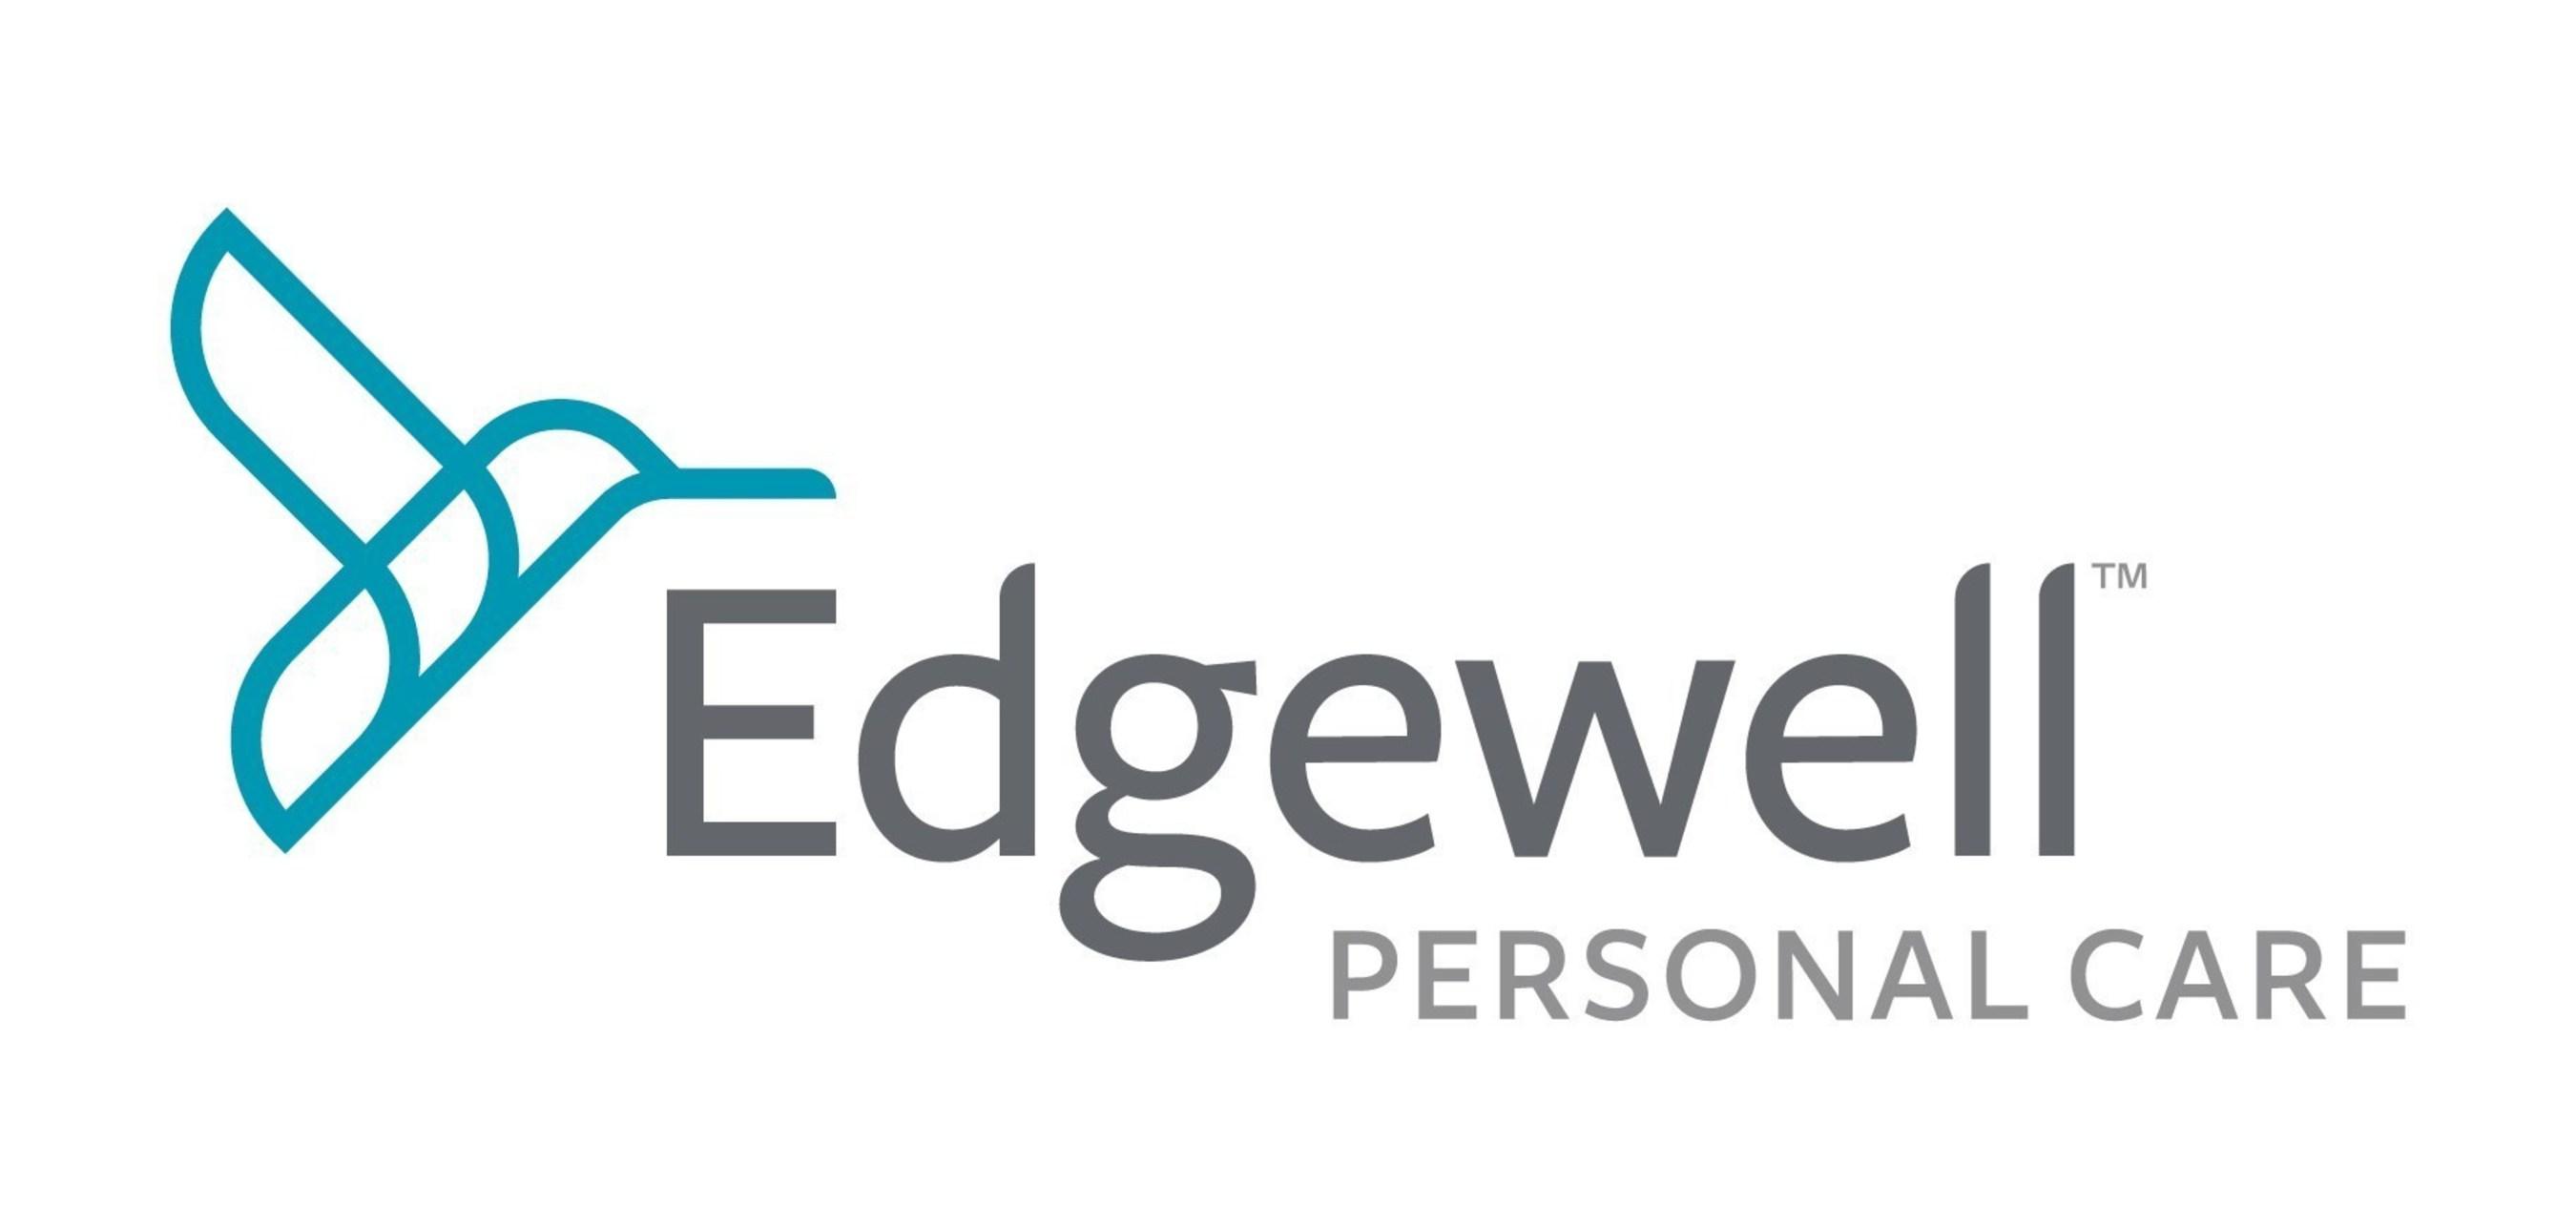 Edgewell Personal Care Company logo